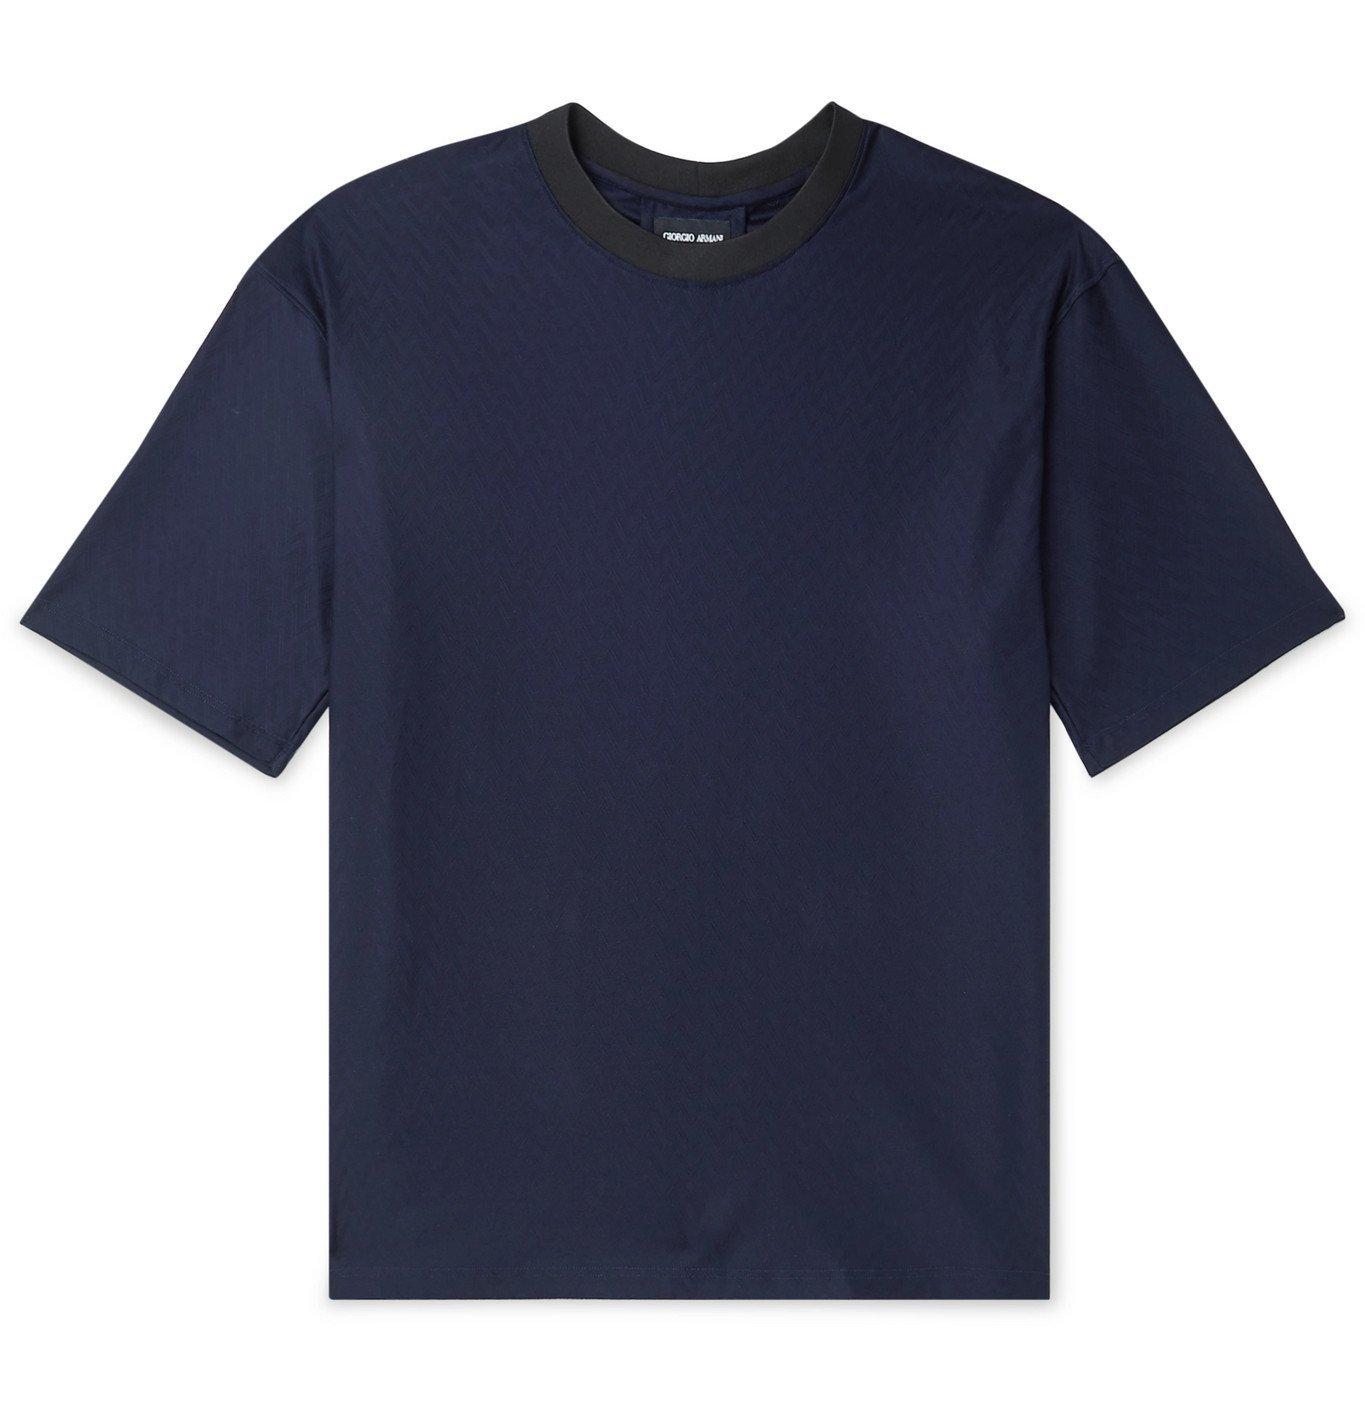 Giorgio Armani - Herringbone Cotton-Jacquard T-Shirt - Blue